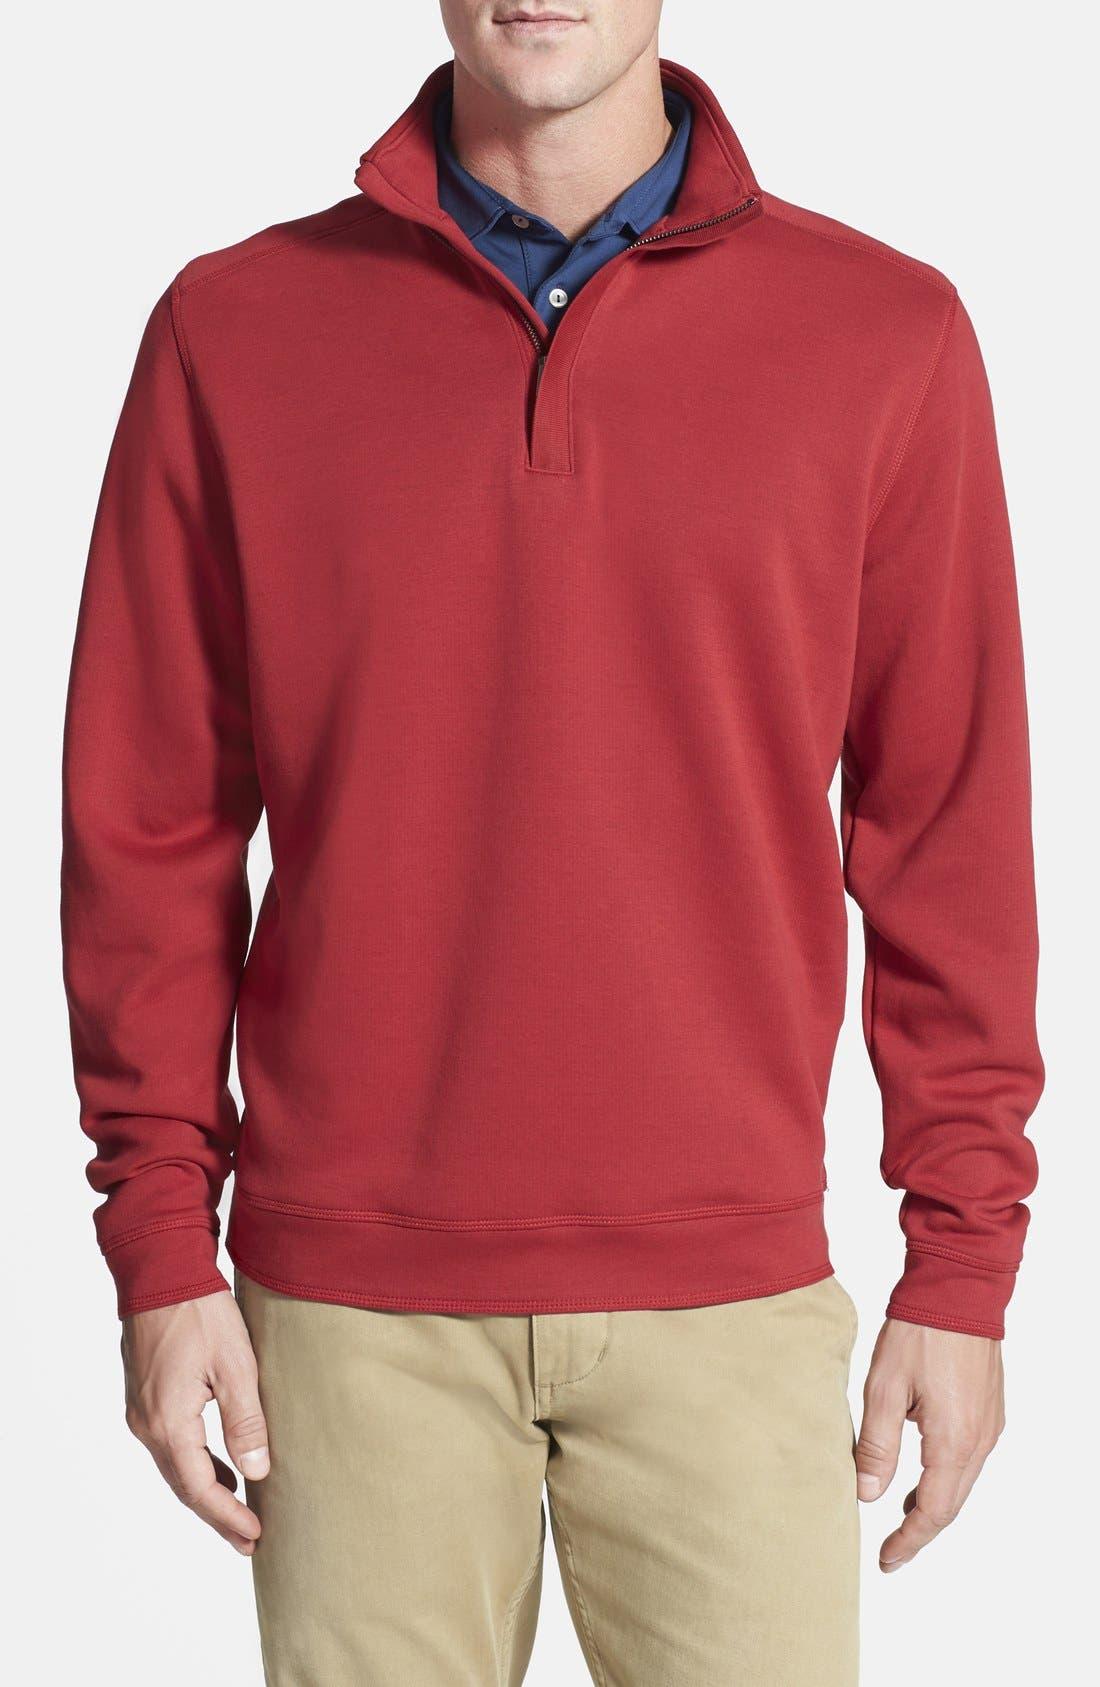 CUTTER & BUCK Decatur Pima Cotton Pullover